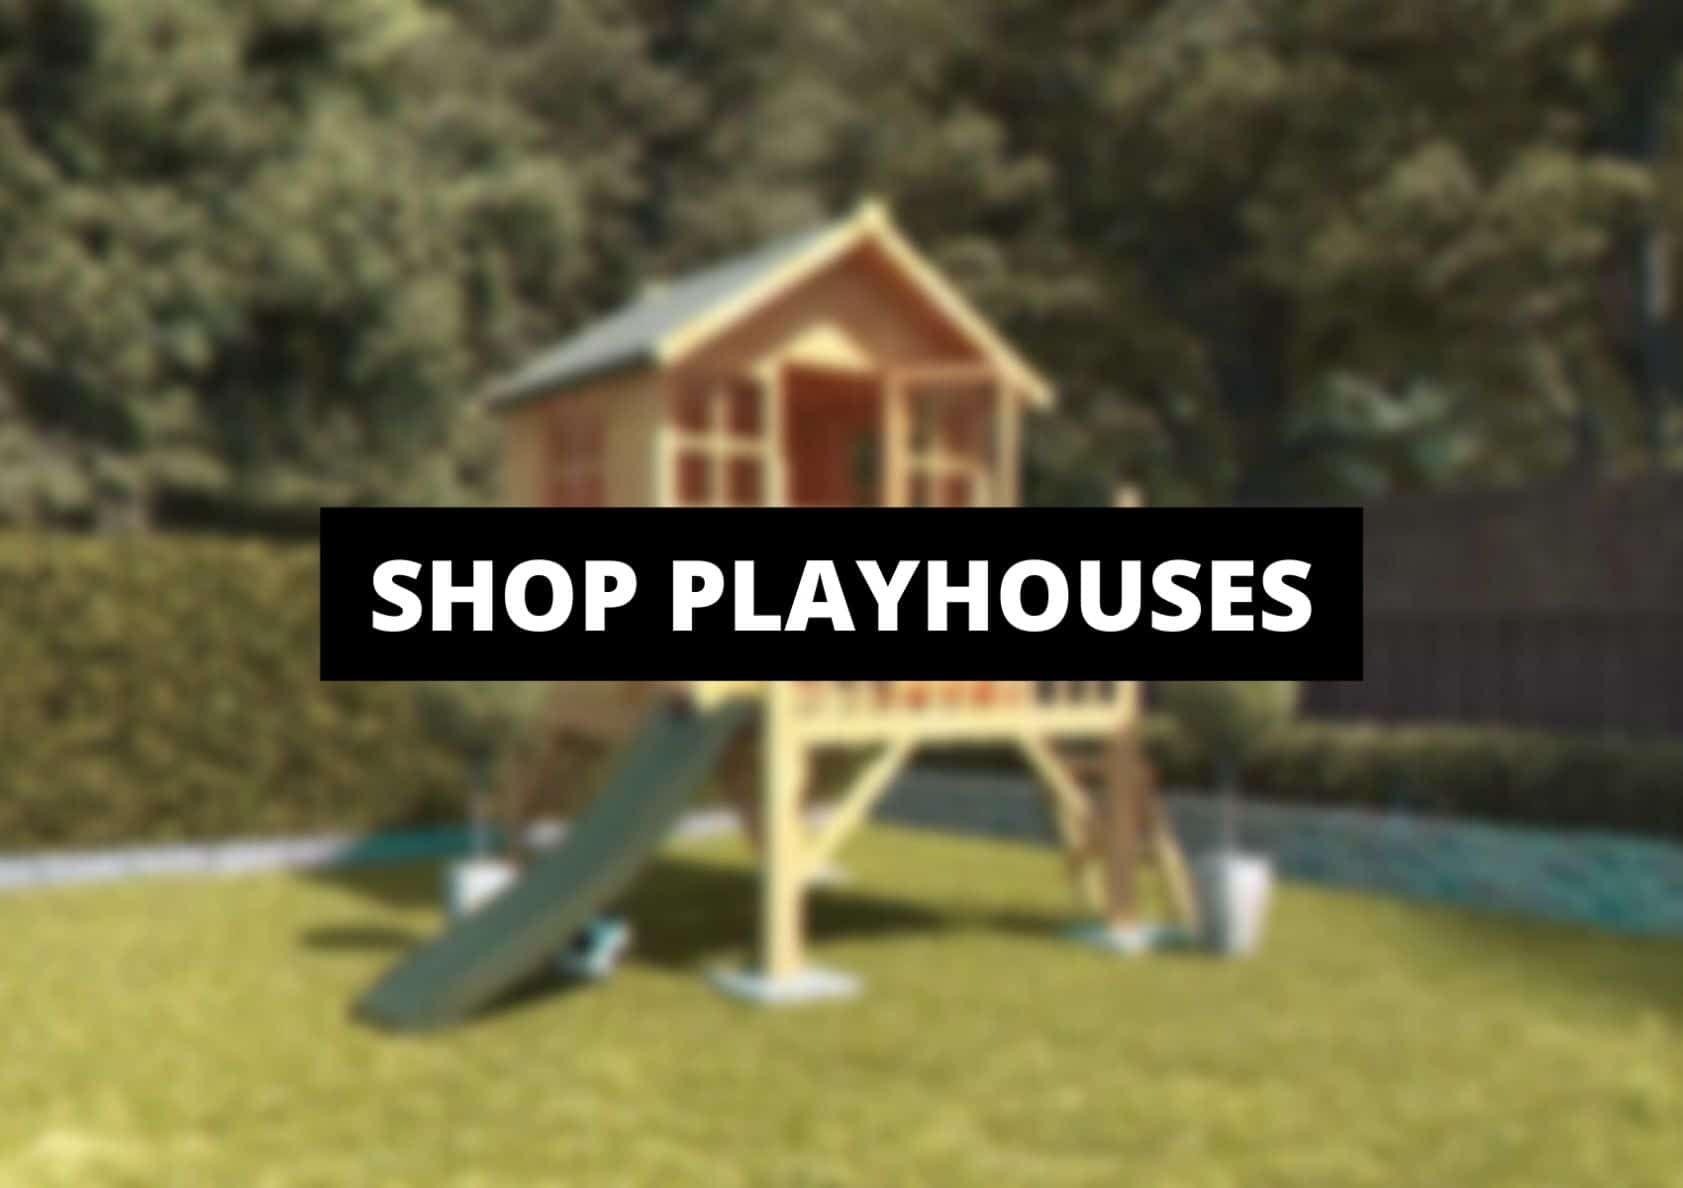 shop-playhouses-button